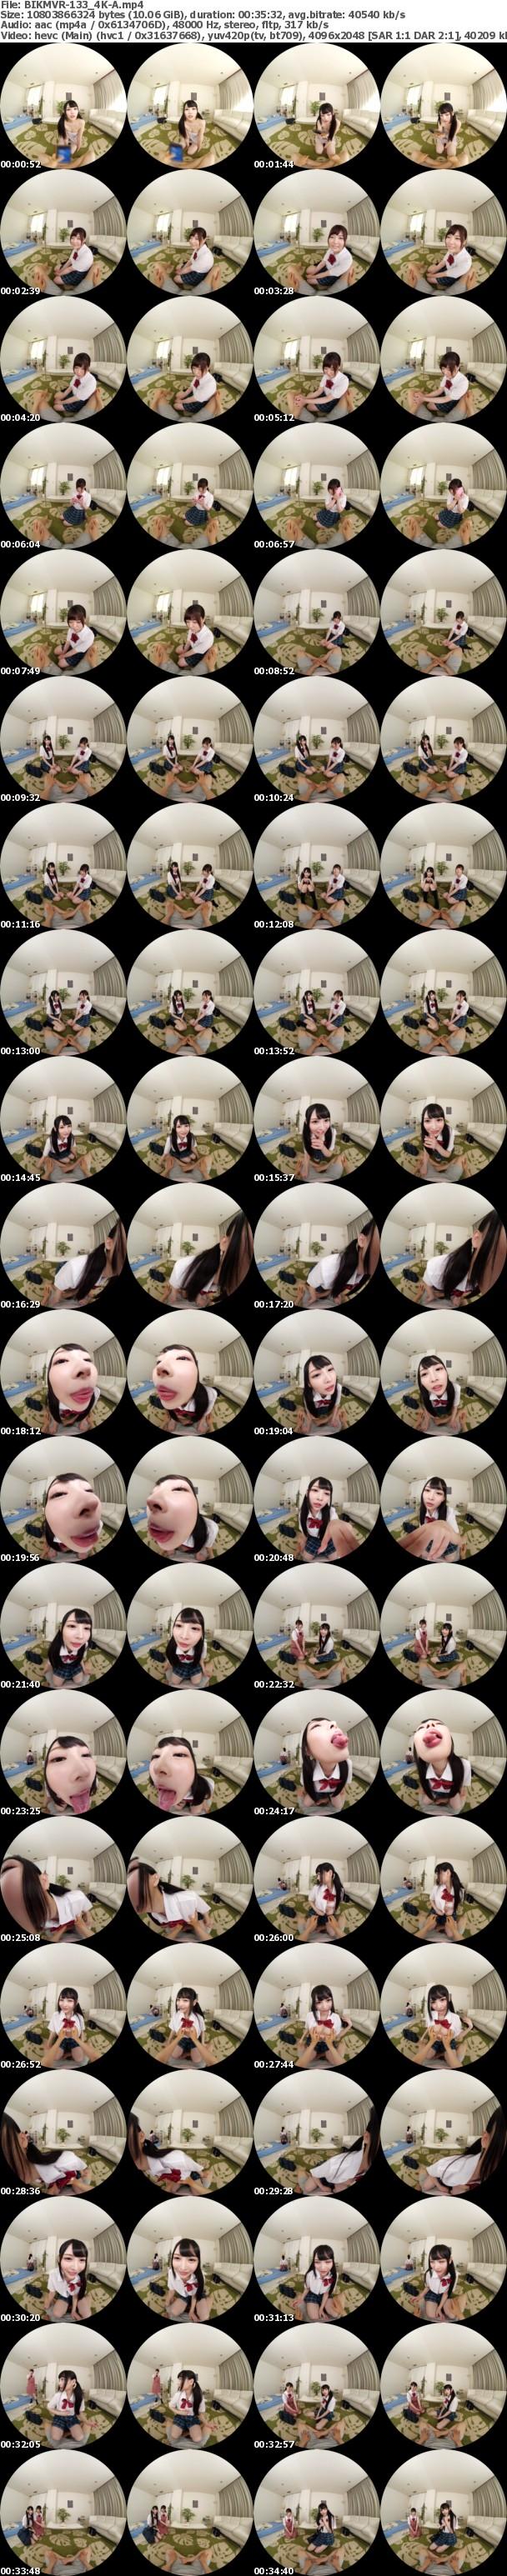 (VR) BIKMVR-133 【4K】小悪魔美少女の全力誘惑!?チート級にカワイイ同級生にヒソヒソ淫語で痴女られたボク 跡美しゅり